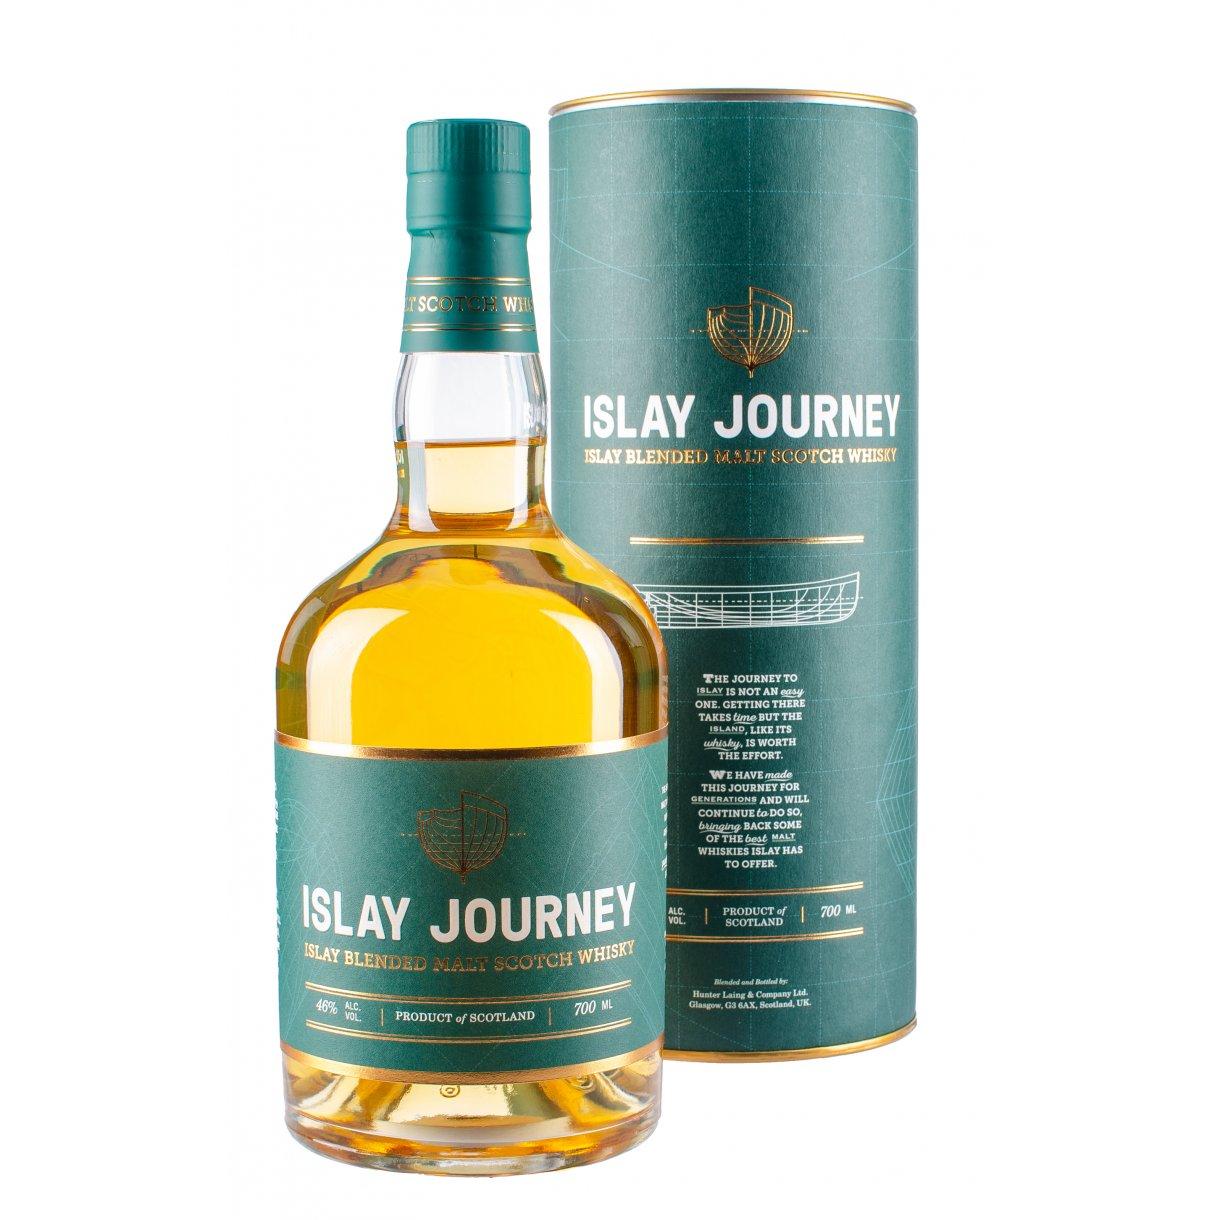 Hunter Laings Islay Journey Islay Blended Malt - 46% Small Batch - Bourbon Hogsheads